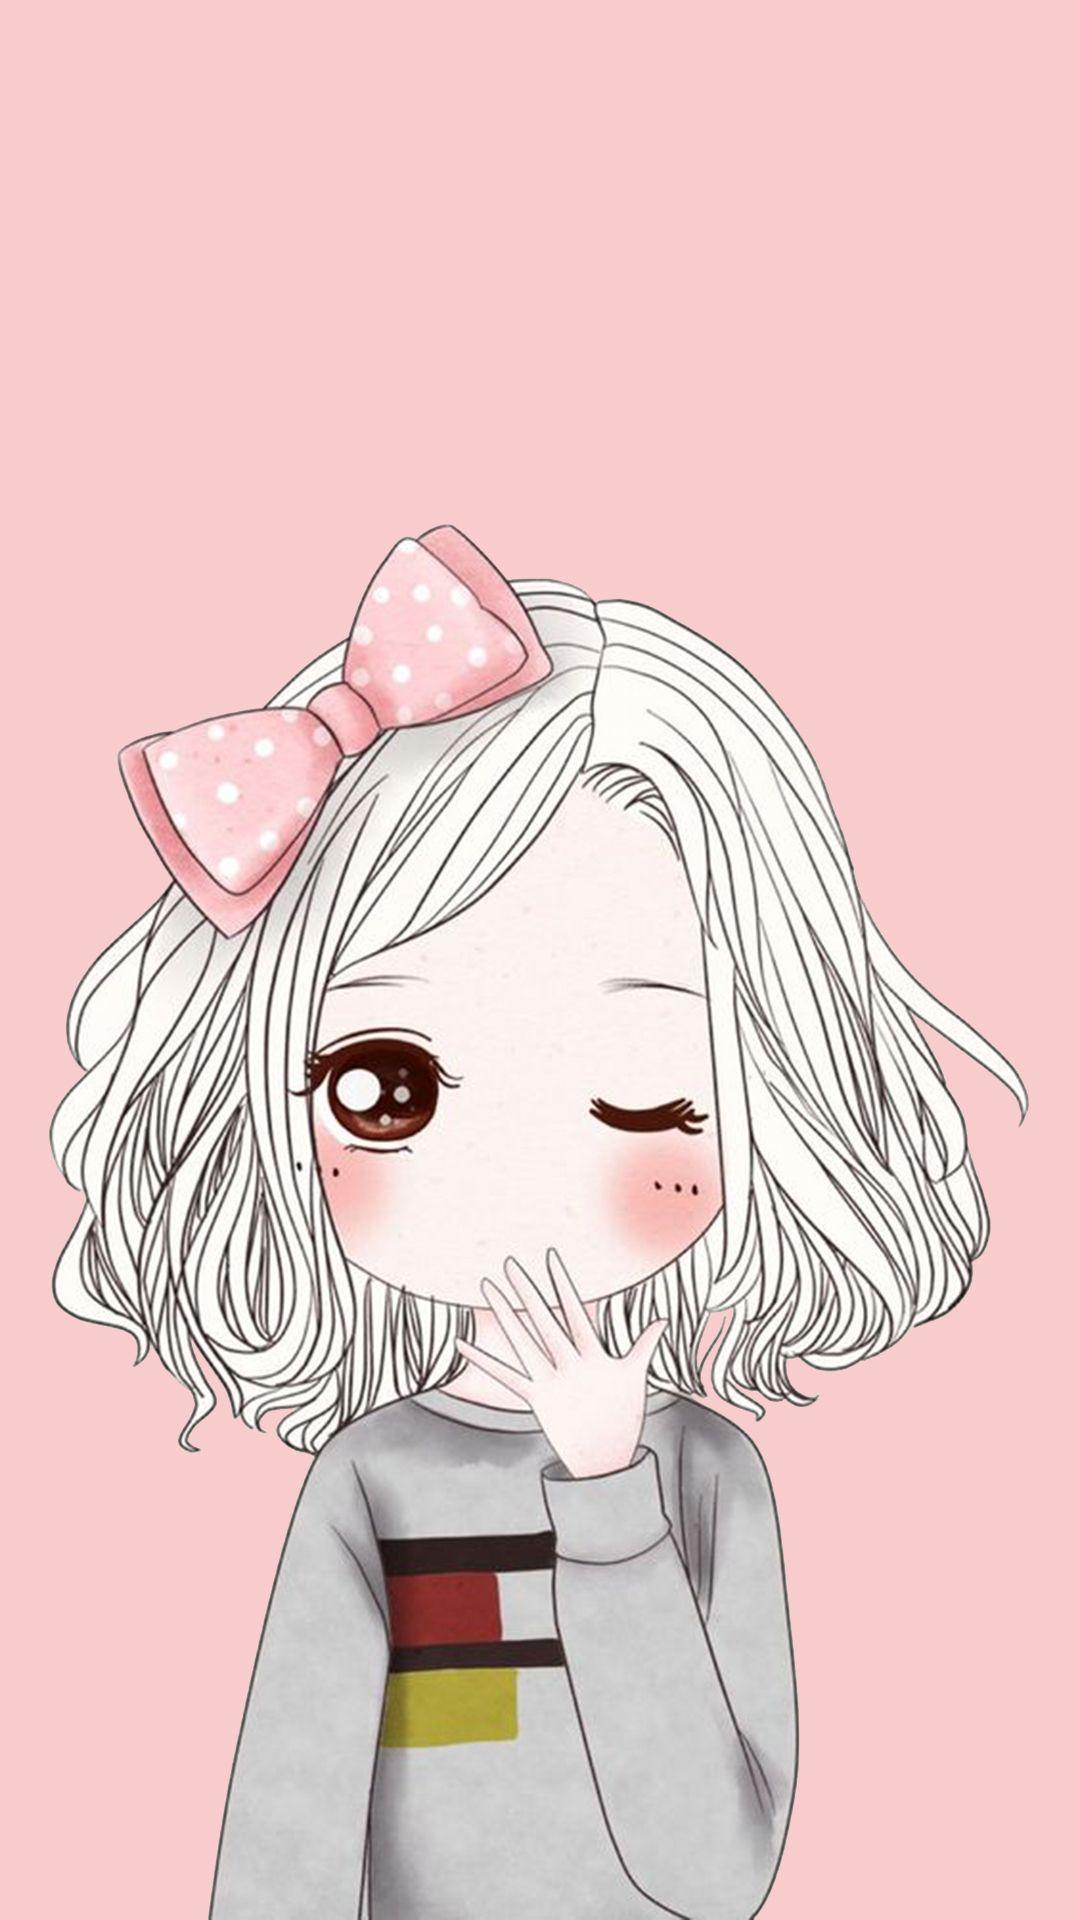 Downloaded From Girly Wallpapers Http Itunes Apple Com App Id11083753 Fondo De Pantalla De Dibujos Animados Fondo De Pantalla De Anime Dibujo De Chica Guapa